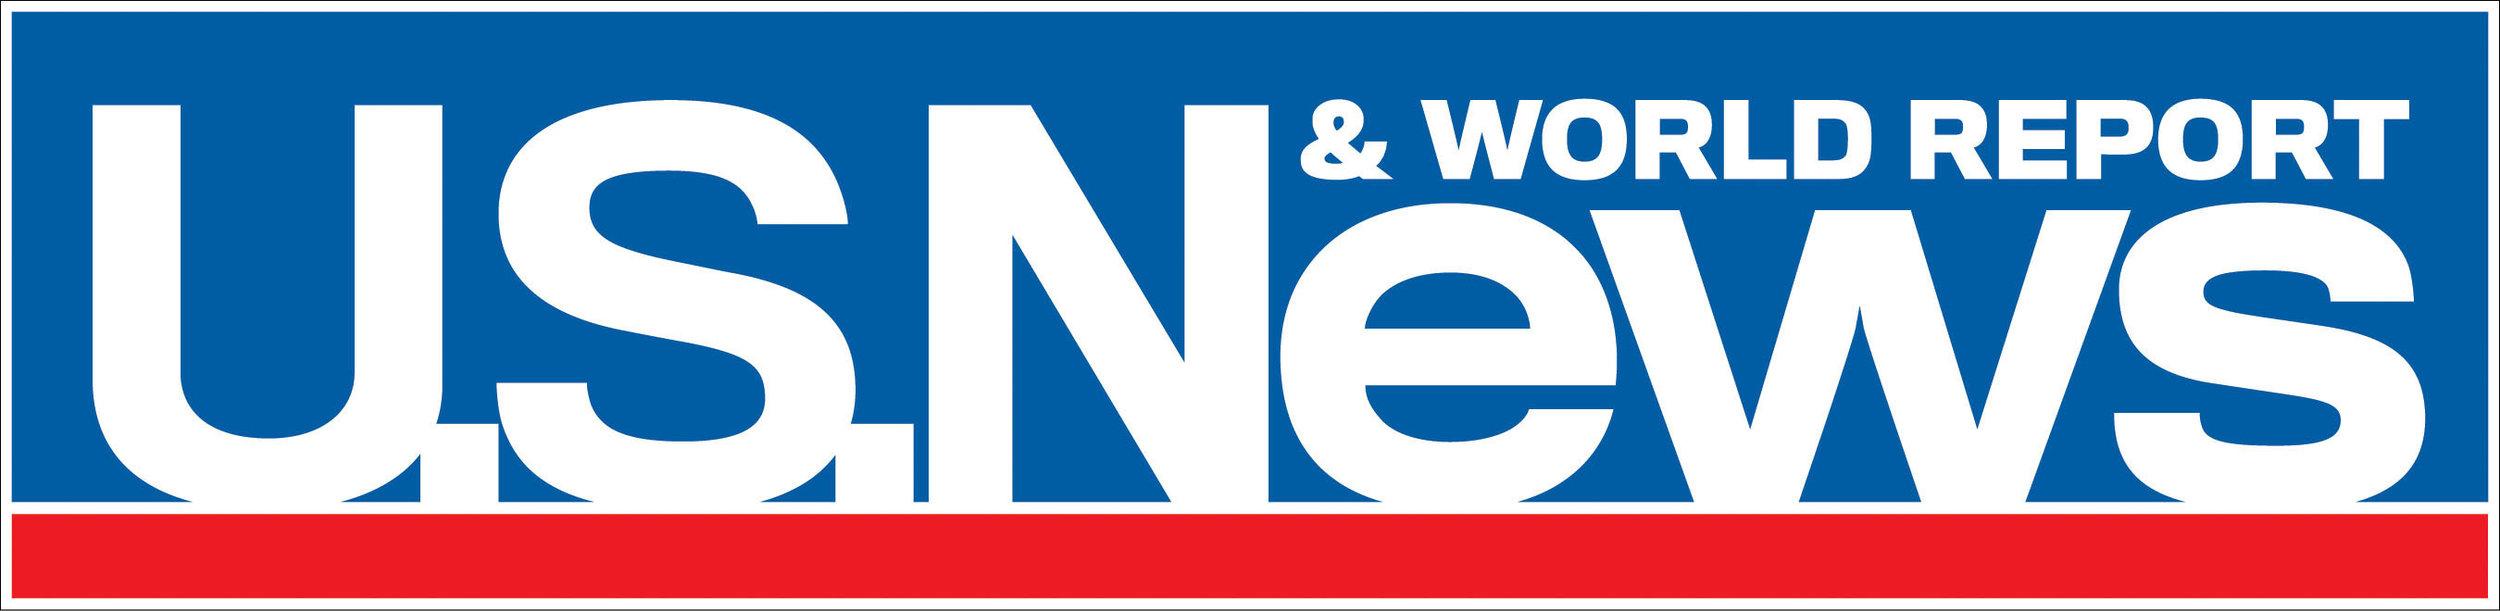 us_news_world_report_logo11.jpg